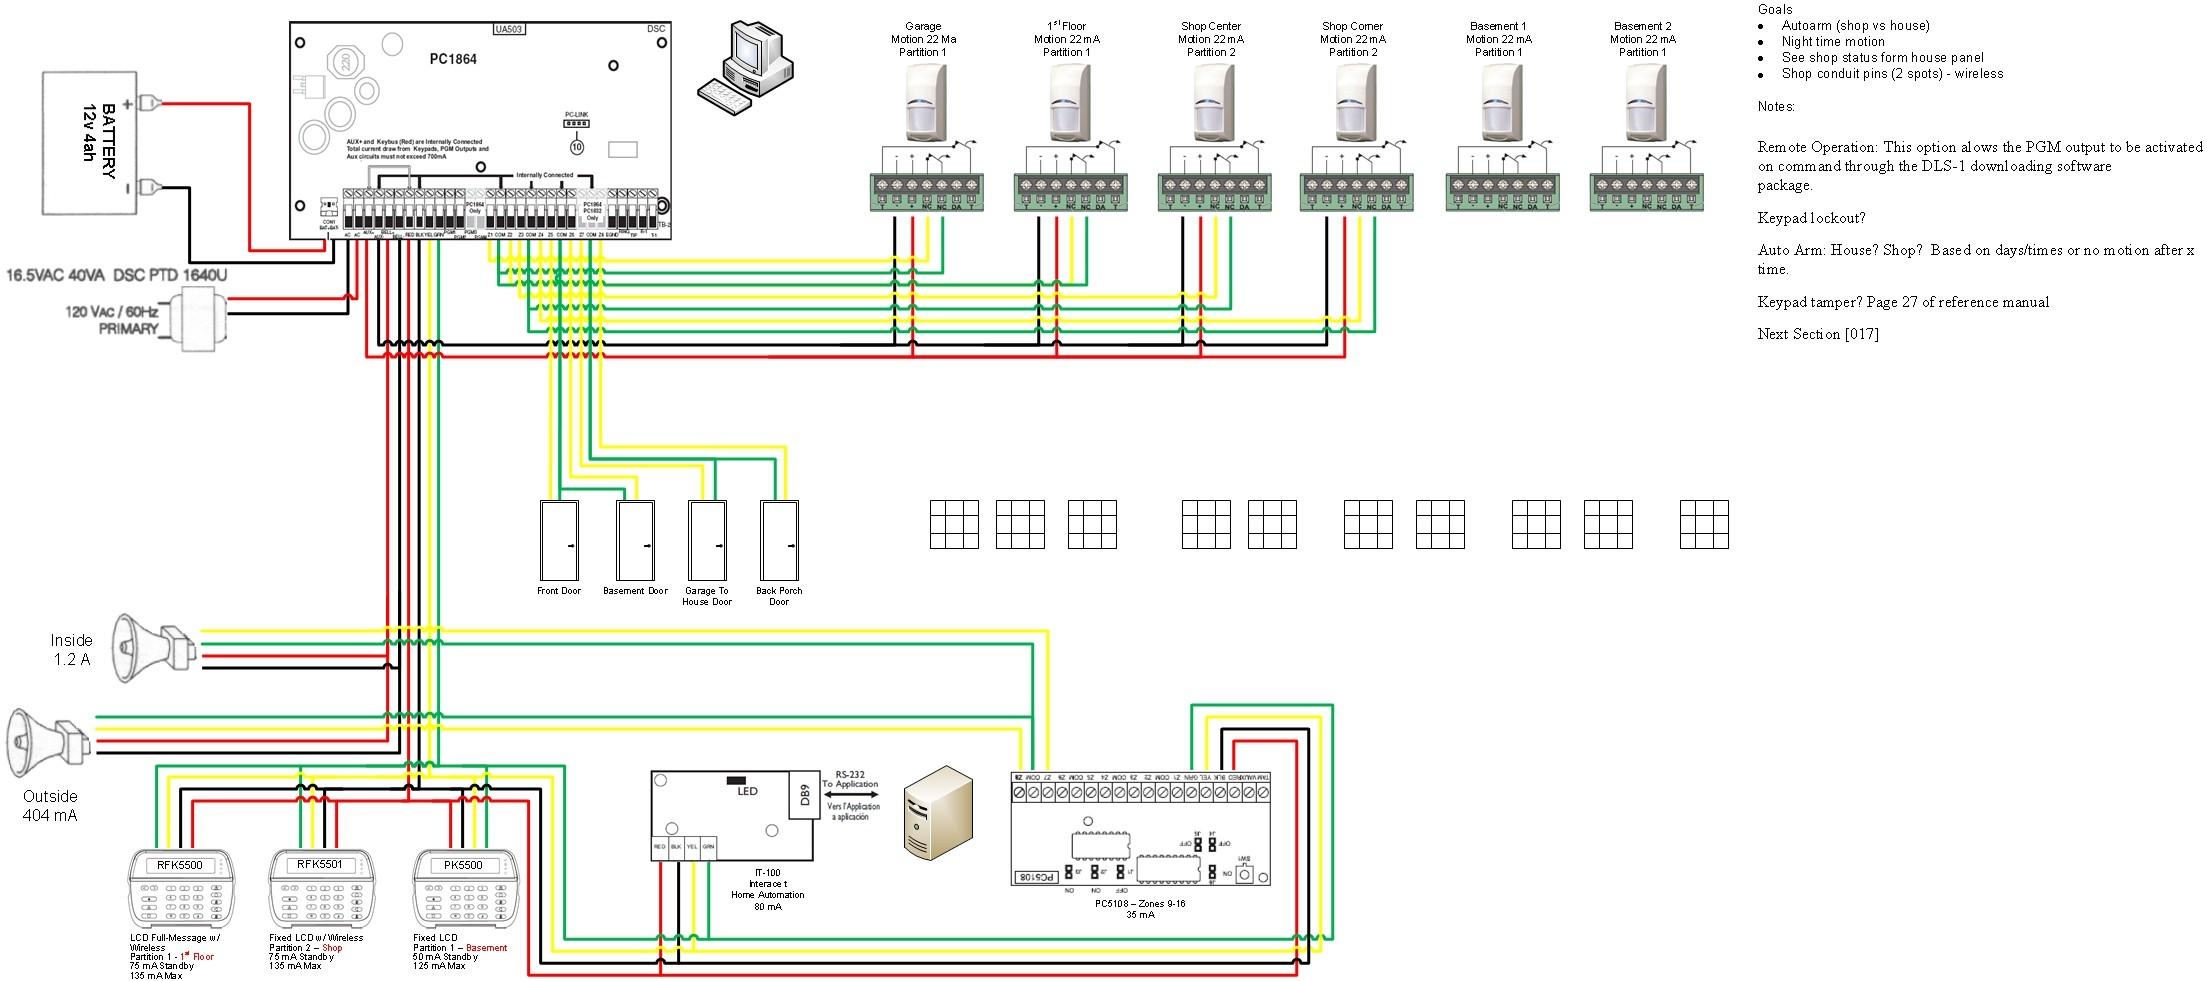 hornet car alarm wiring diagram my wiring diagram lock wire diagram viper remote start car alarms security ebay and 5902 wiring rh blurts me